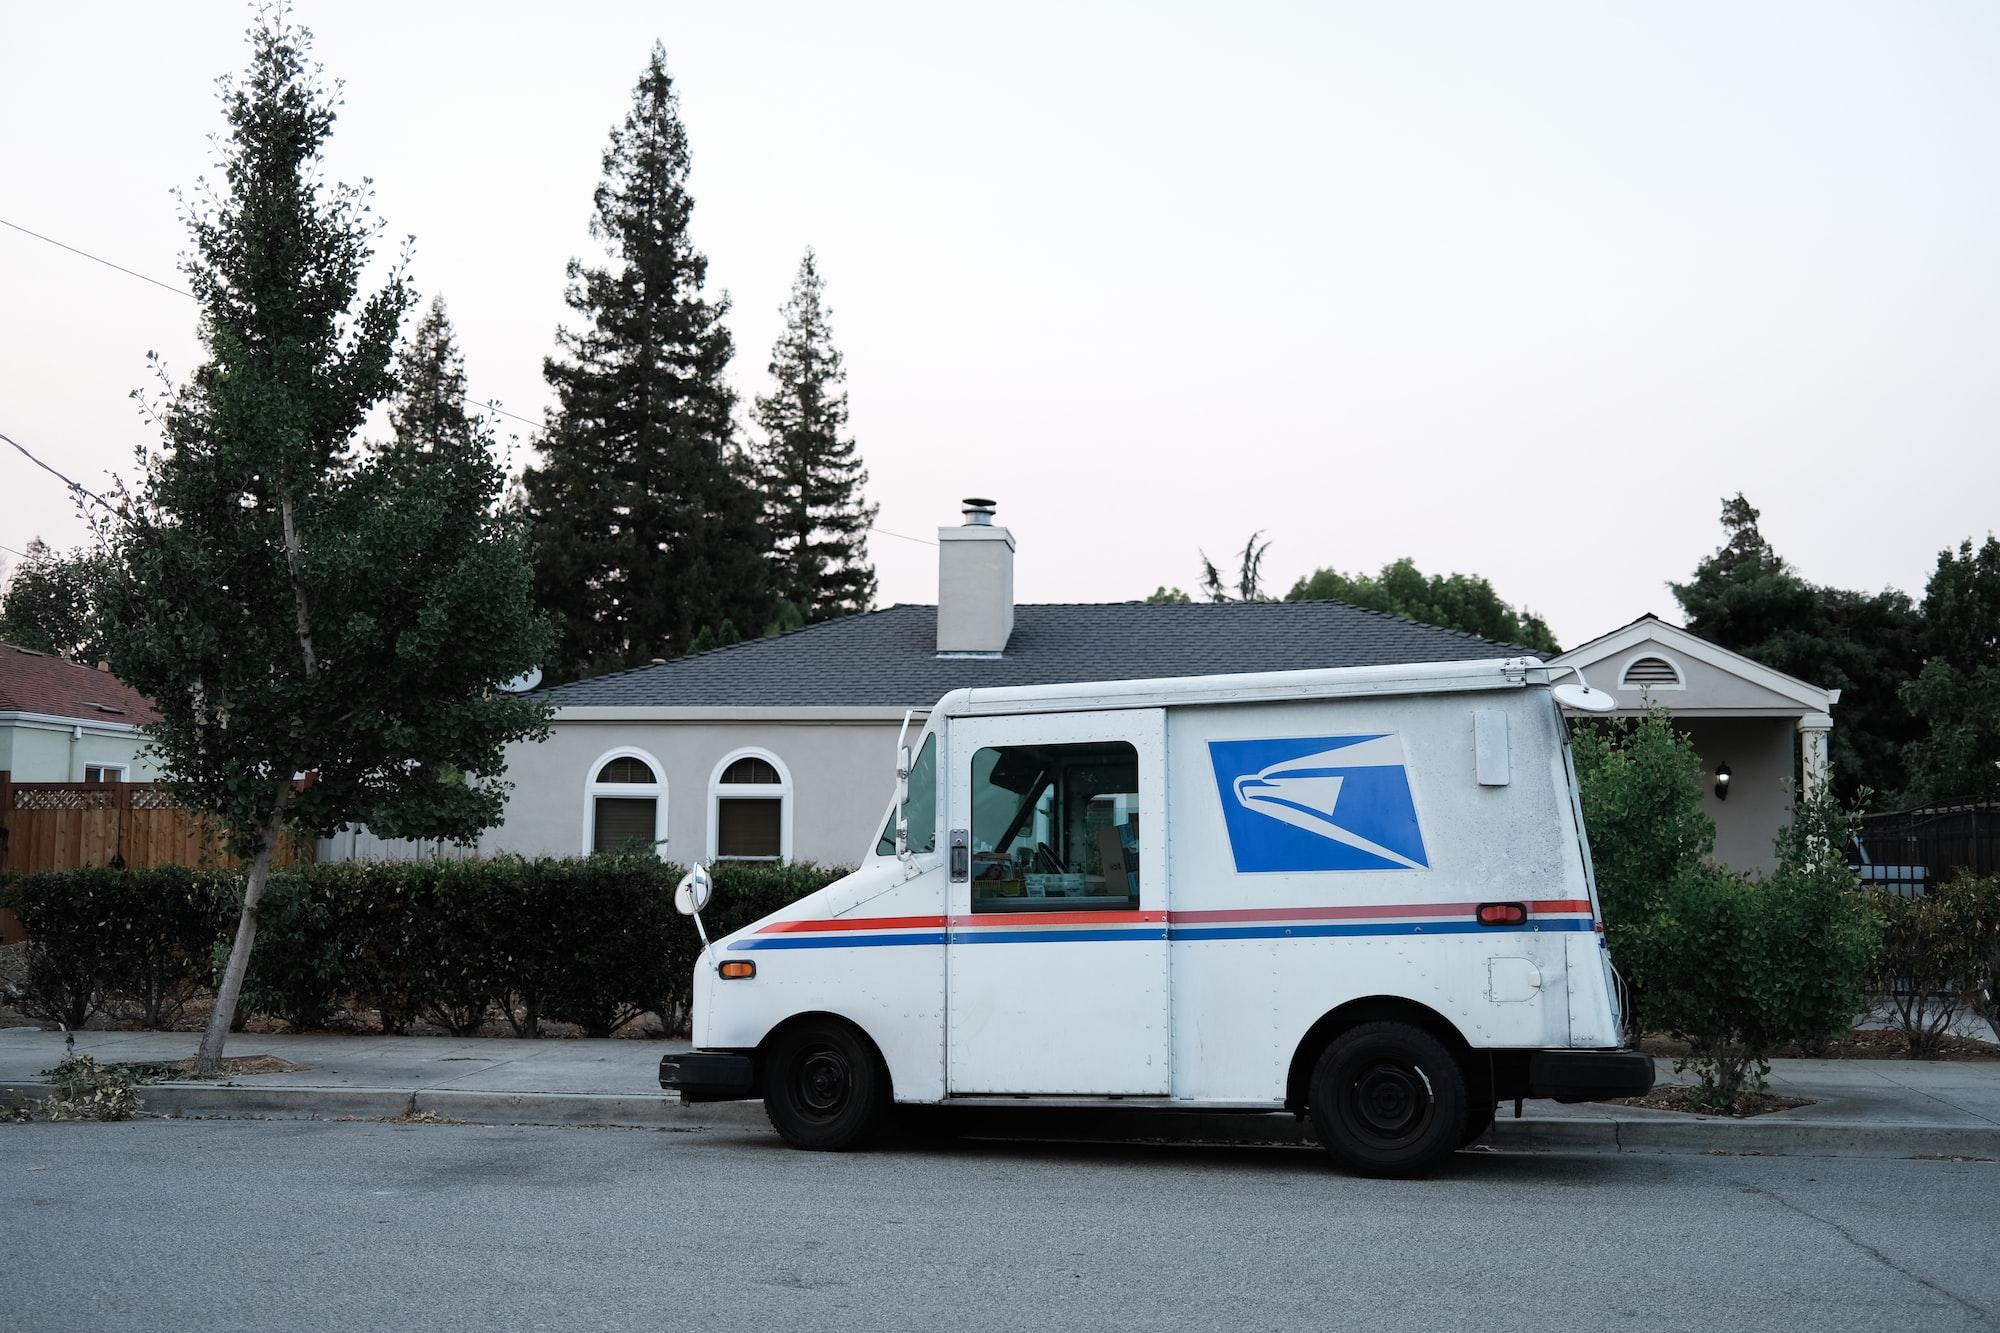 USPS Truck Shipment Tracking